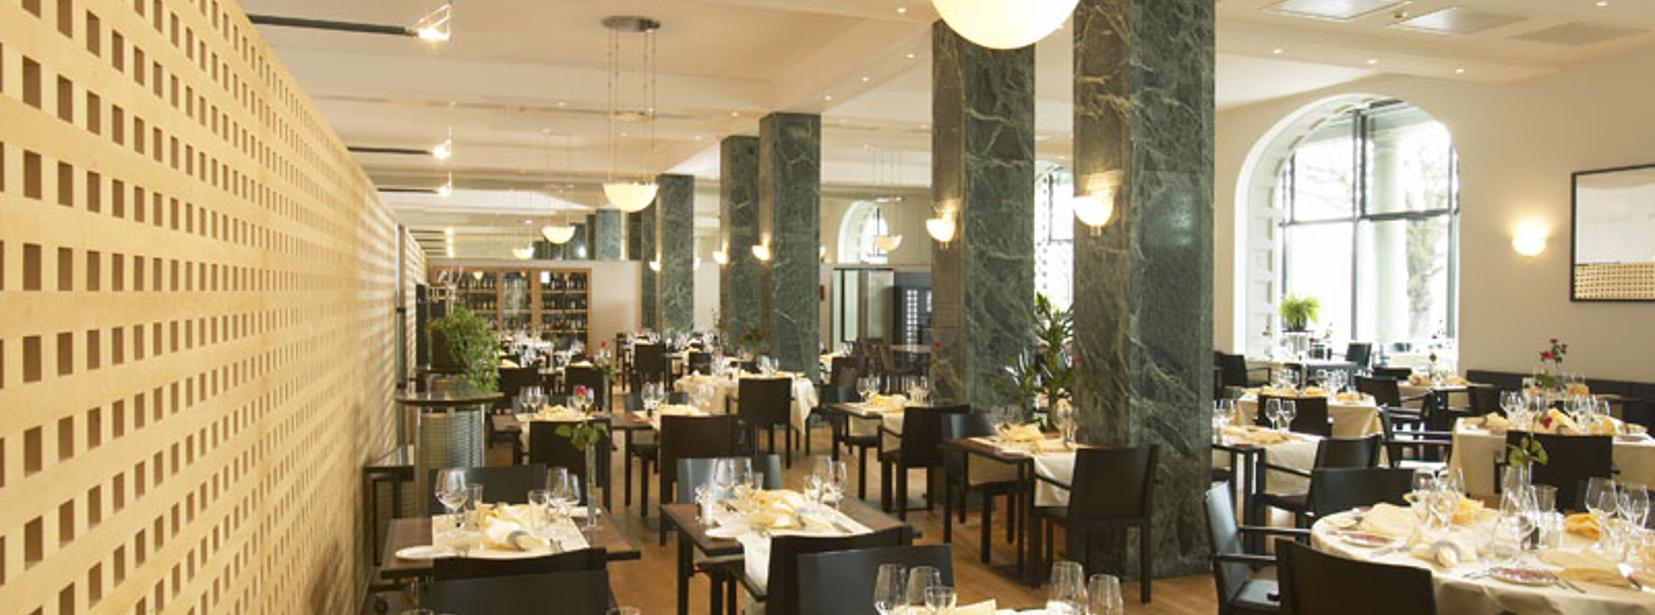 Casino Restaurants Bern Berne MyCityHighlight